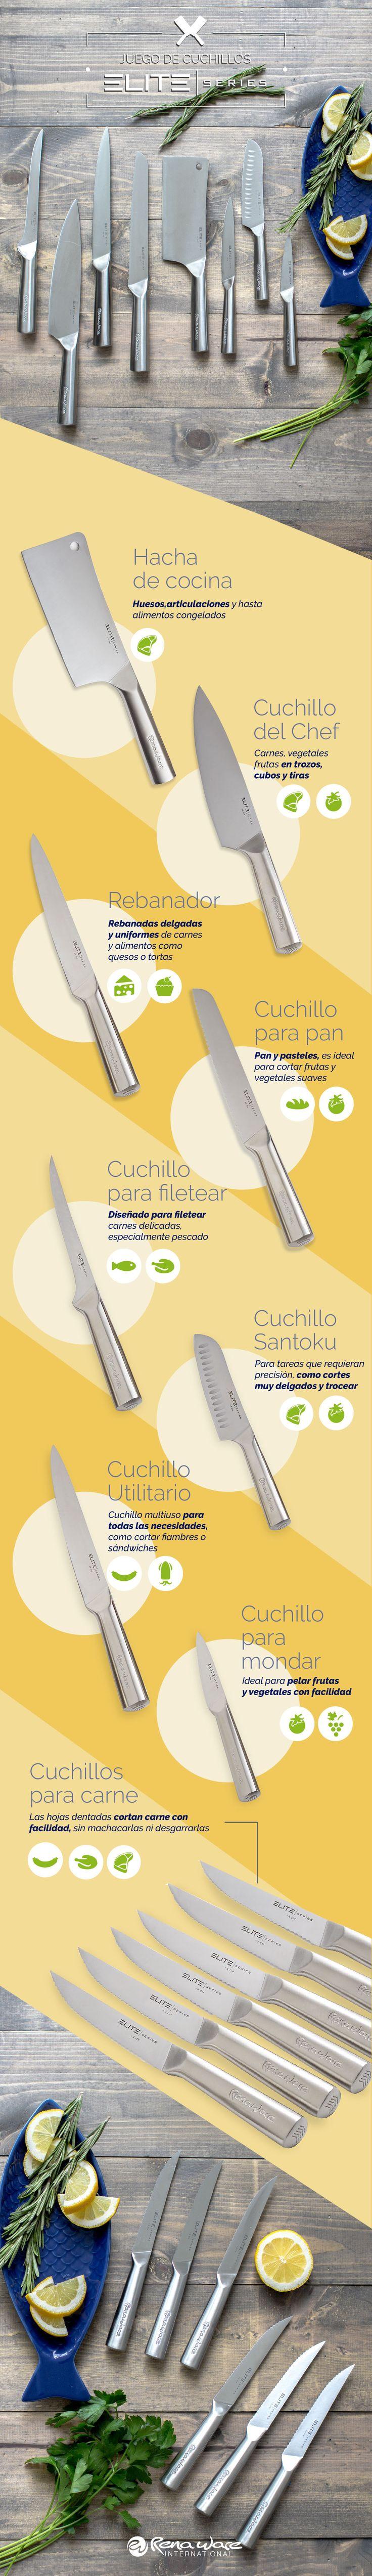 Uso de cada cuchillo del Juego de Cuchillos Serie Élite